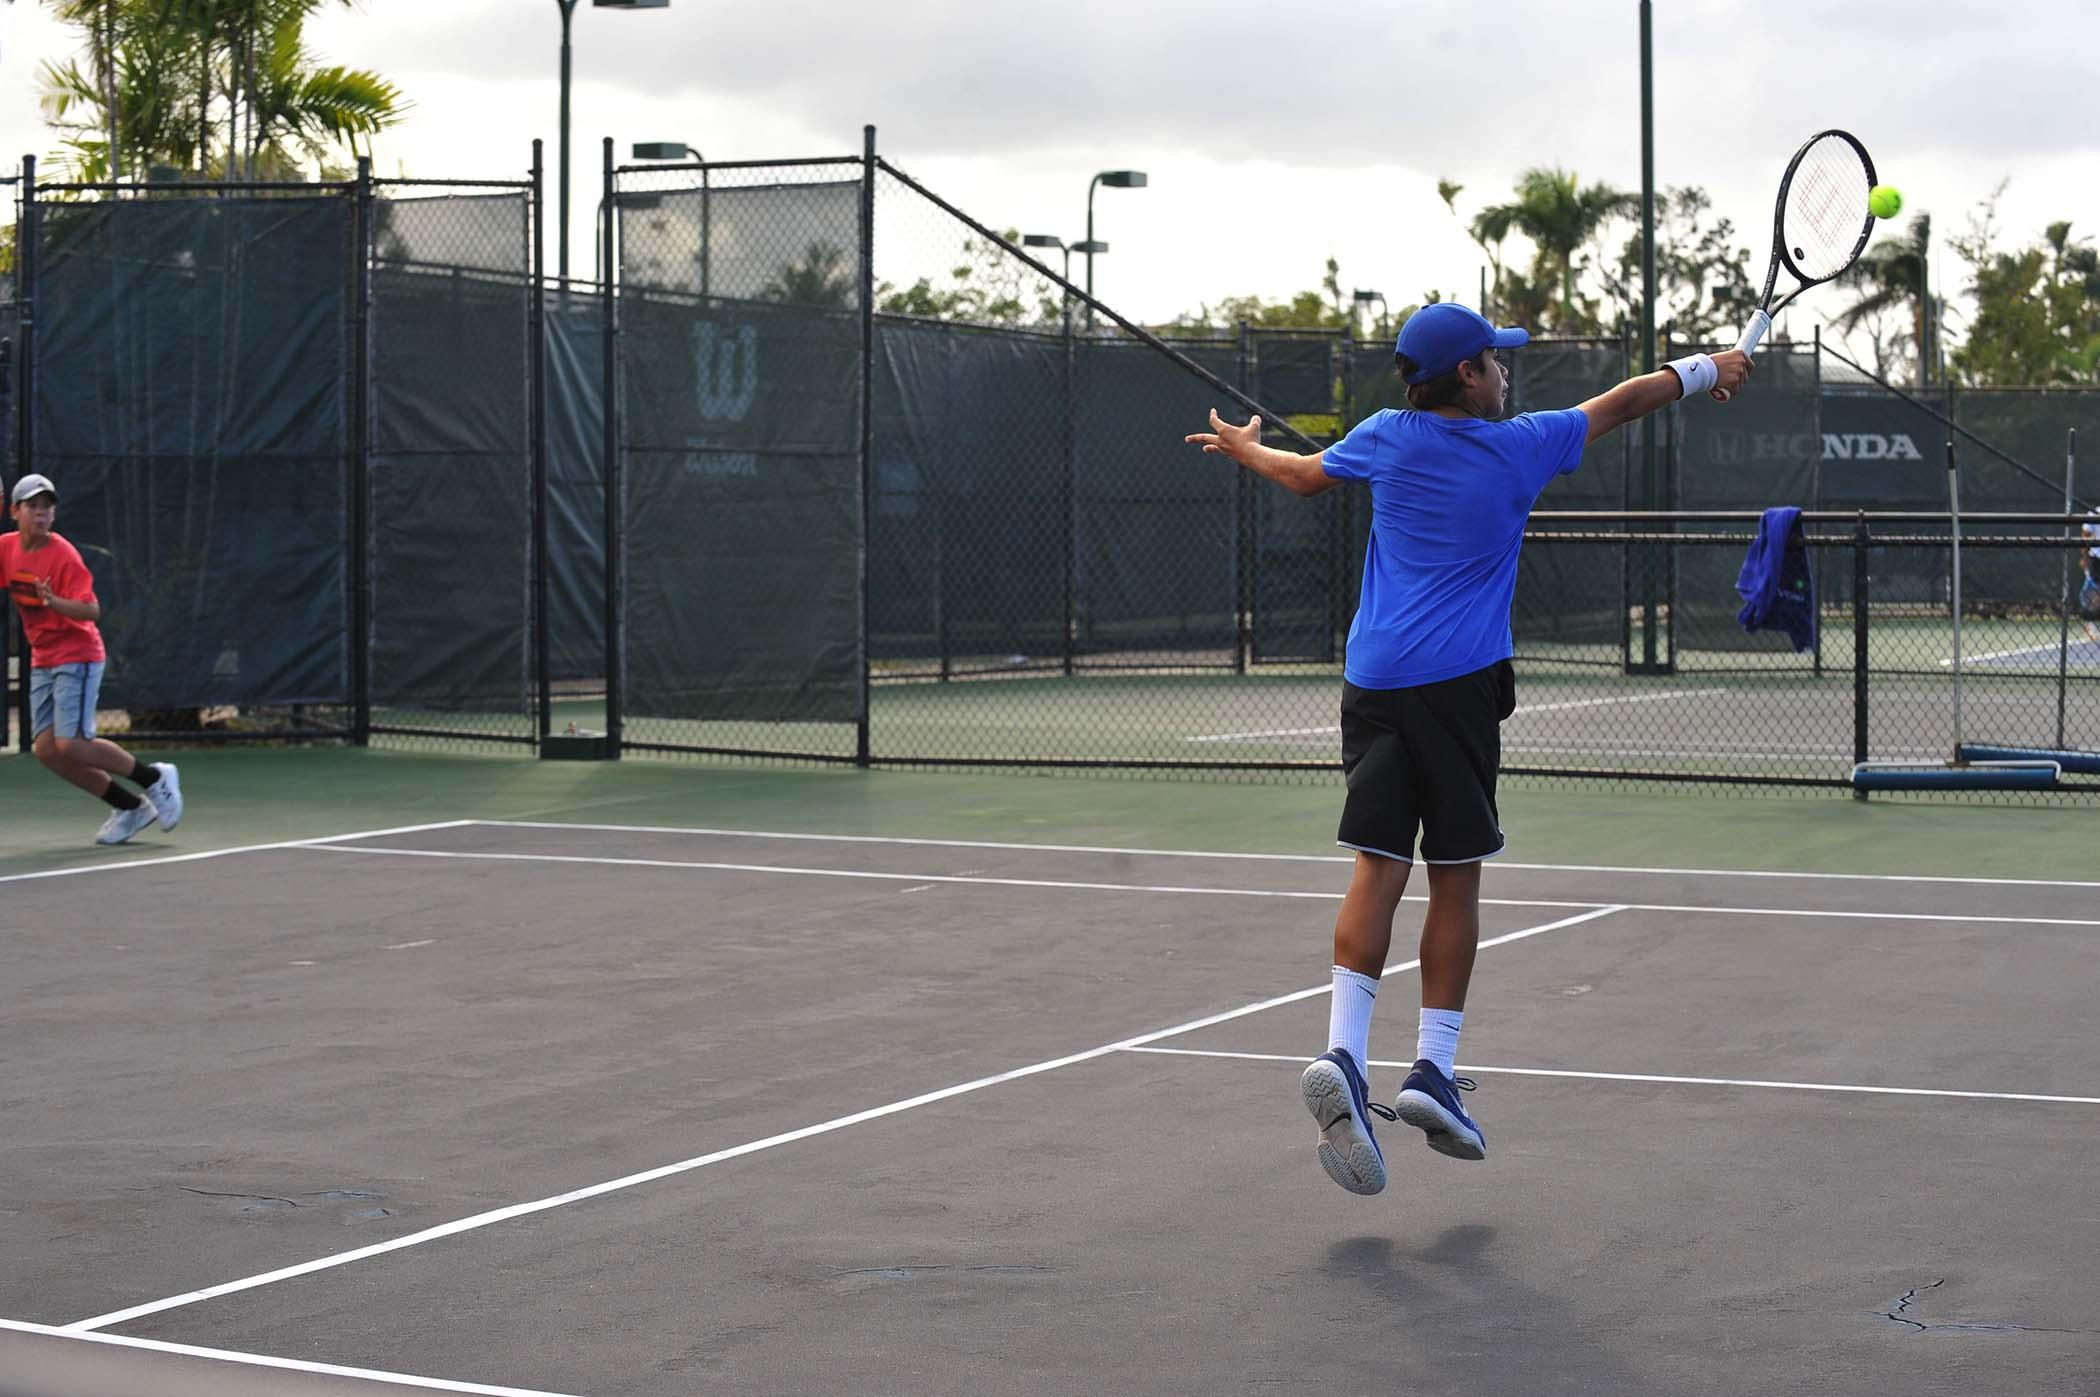 Participantes Tenis Juvenil-2-24-2018-24.jpg